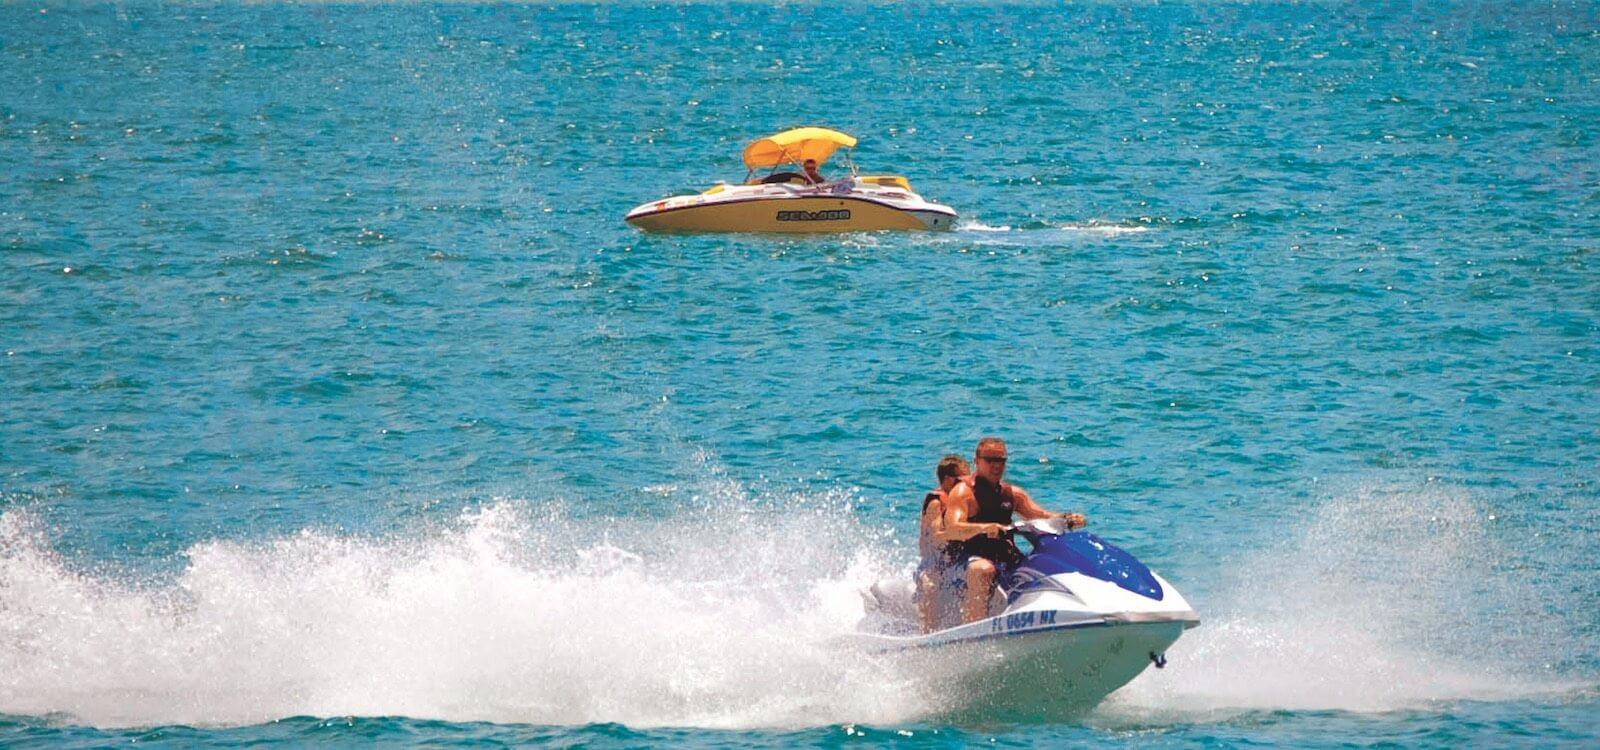 MustDo.com | Sarasota, Florida vacation watersport activities include jet ski, WaveRunner, and boat rentals.